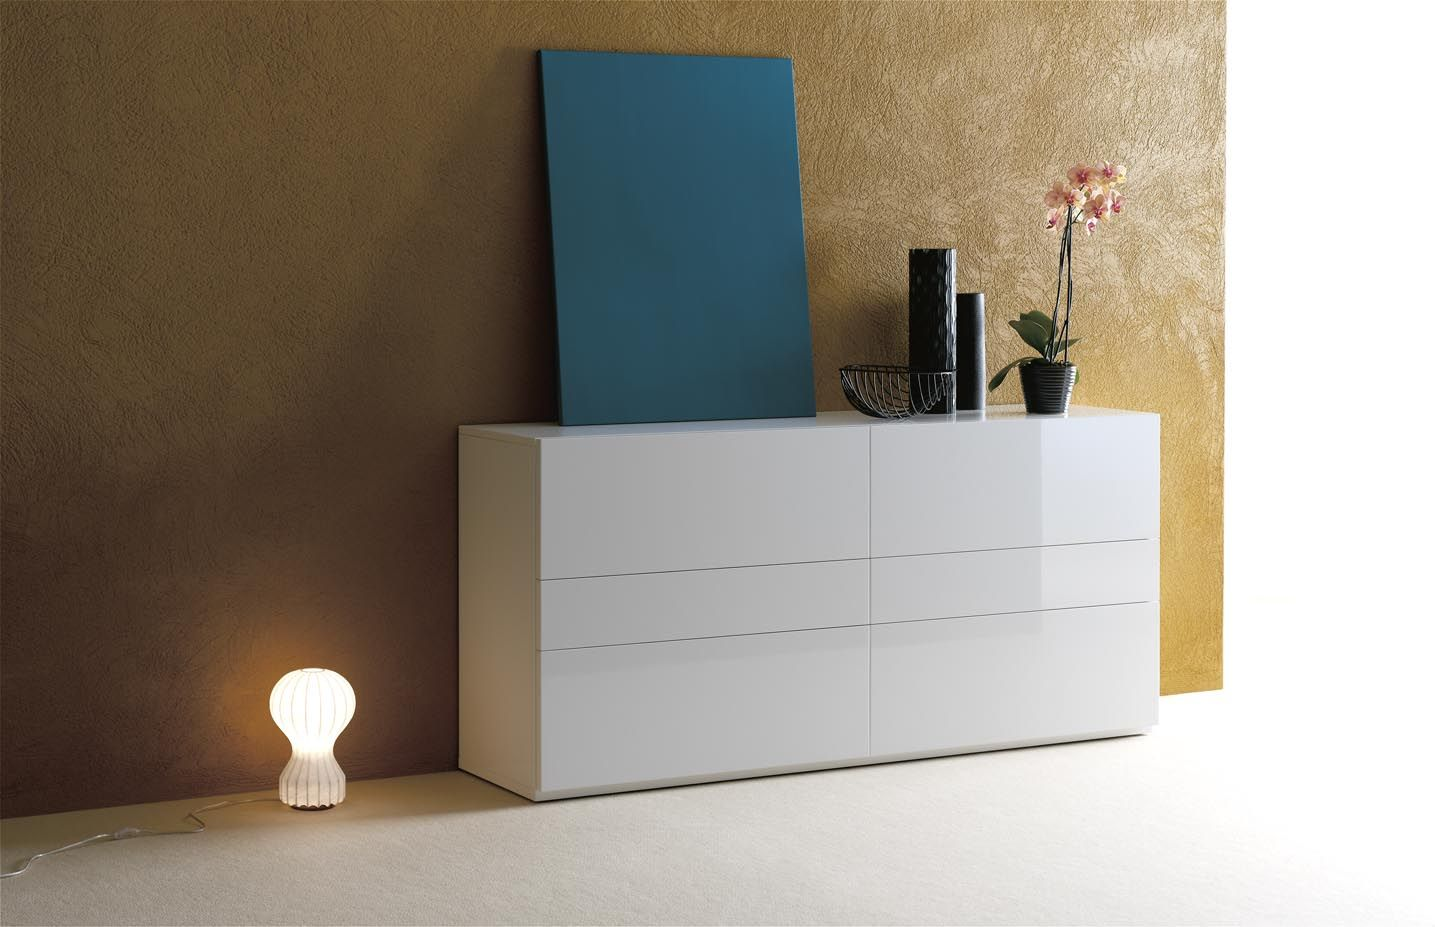 Fotografia comedor #fotografia #muebles #decoracion #comedores ...